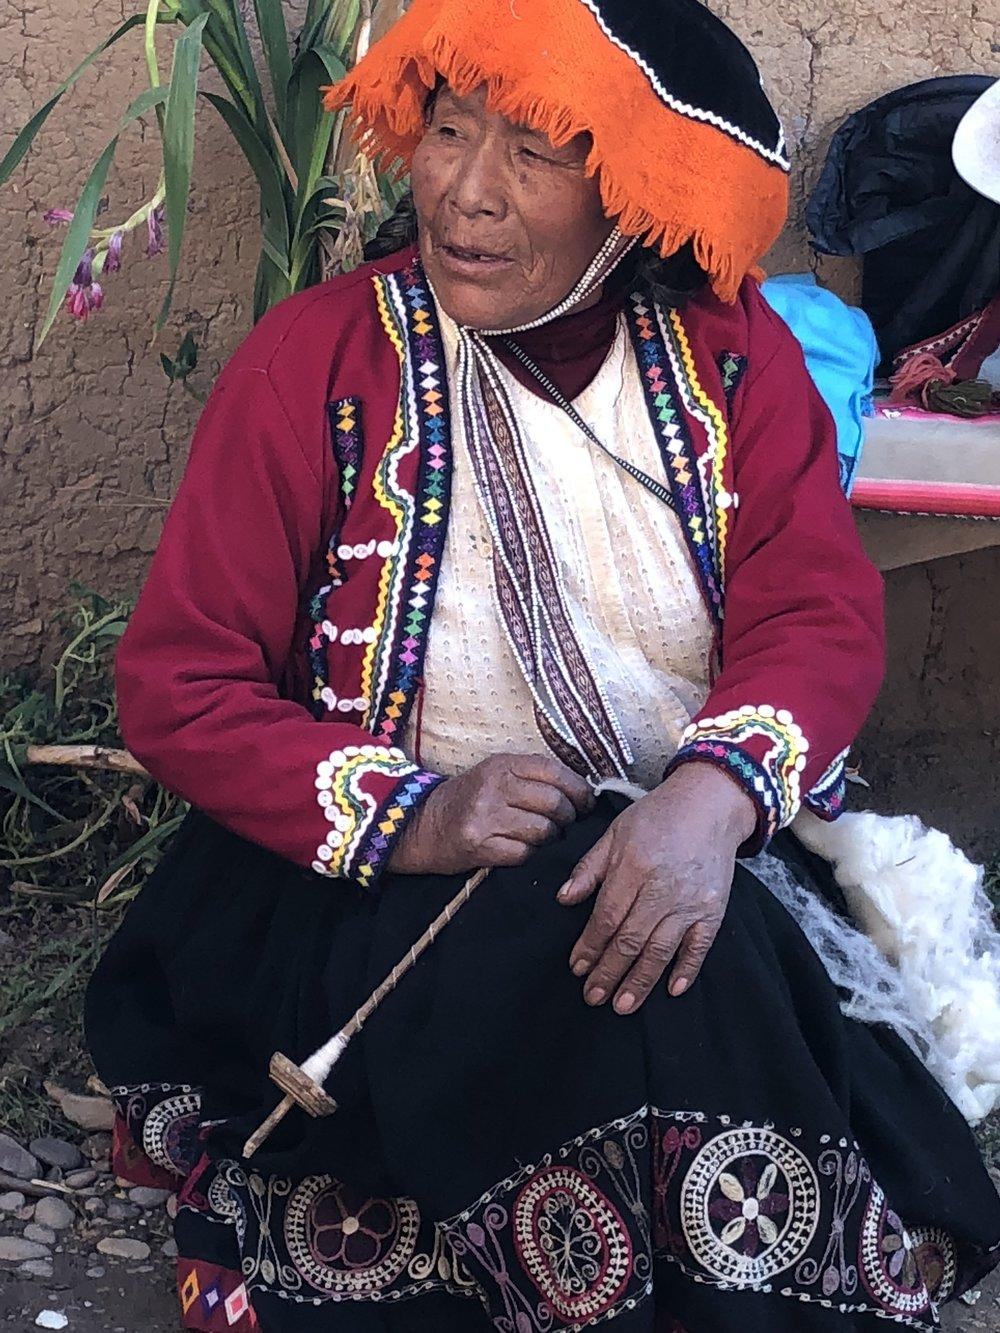 Spinning lama wool into yarn